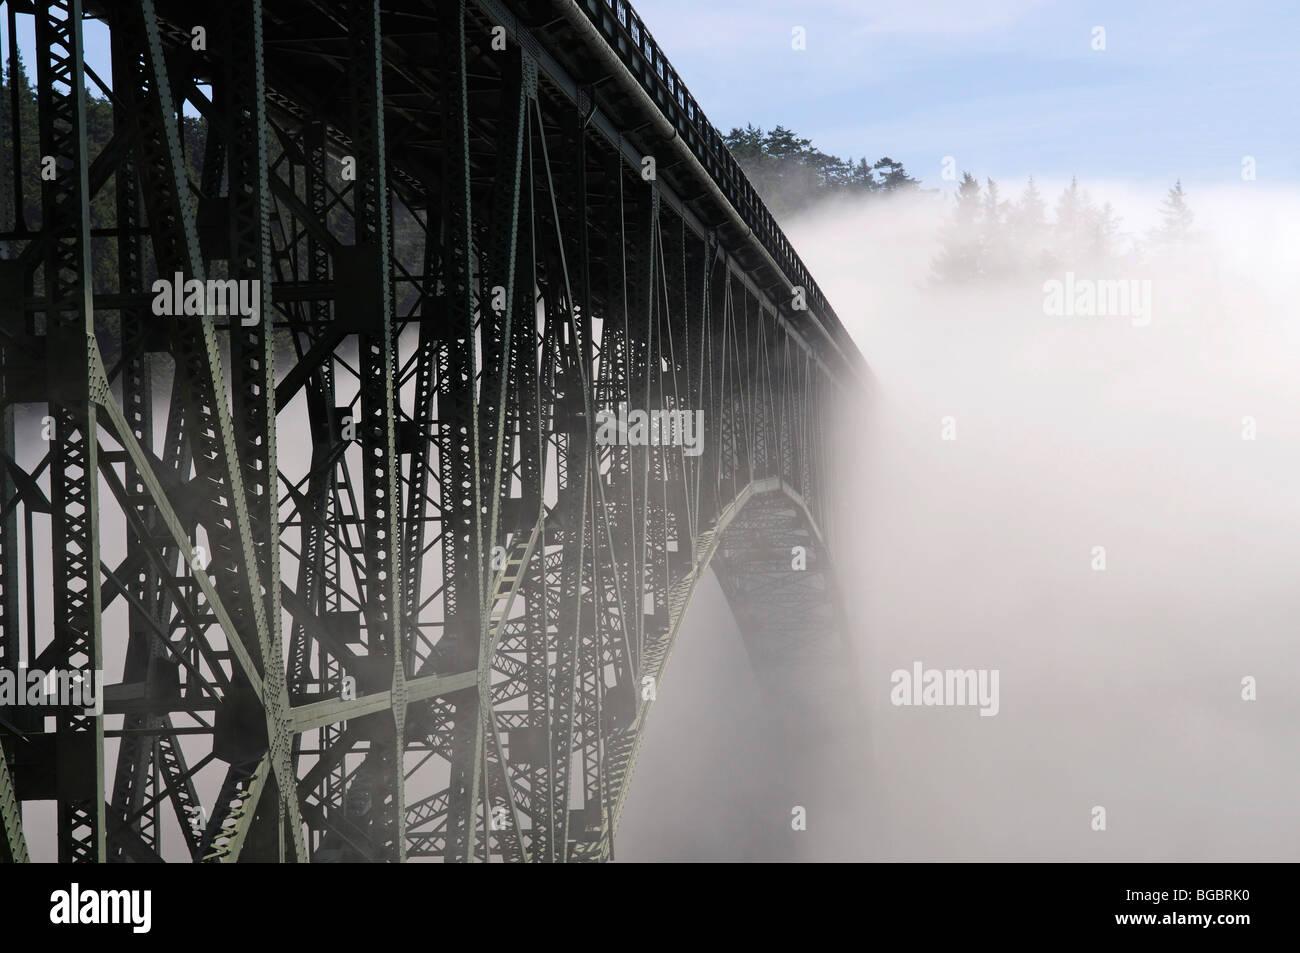 Deception Pass Bridge, Kitsap County, Washington, USA - Stock Image